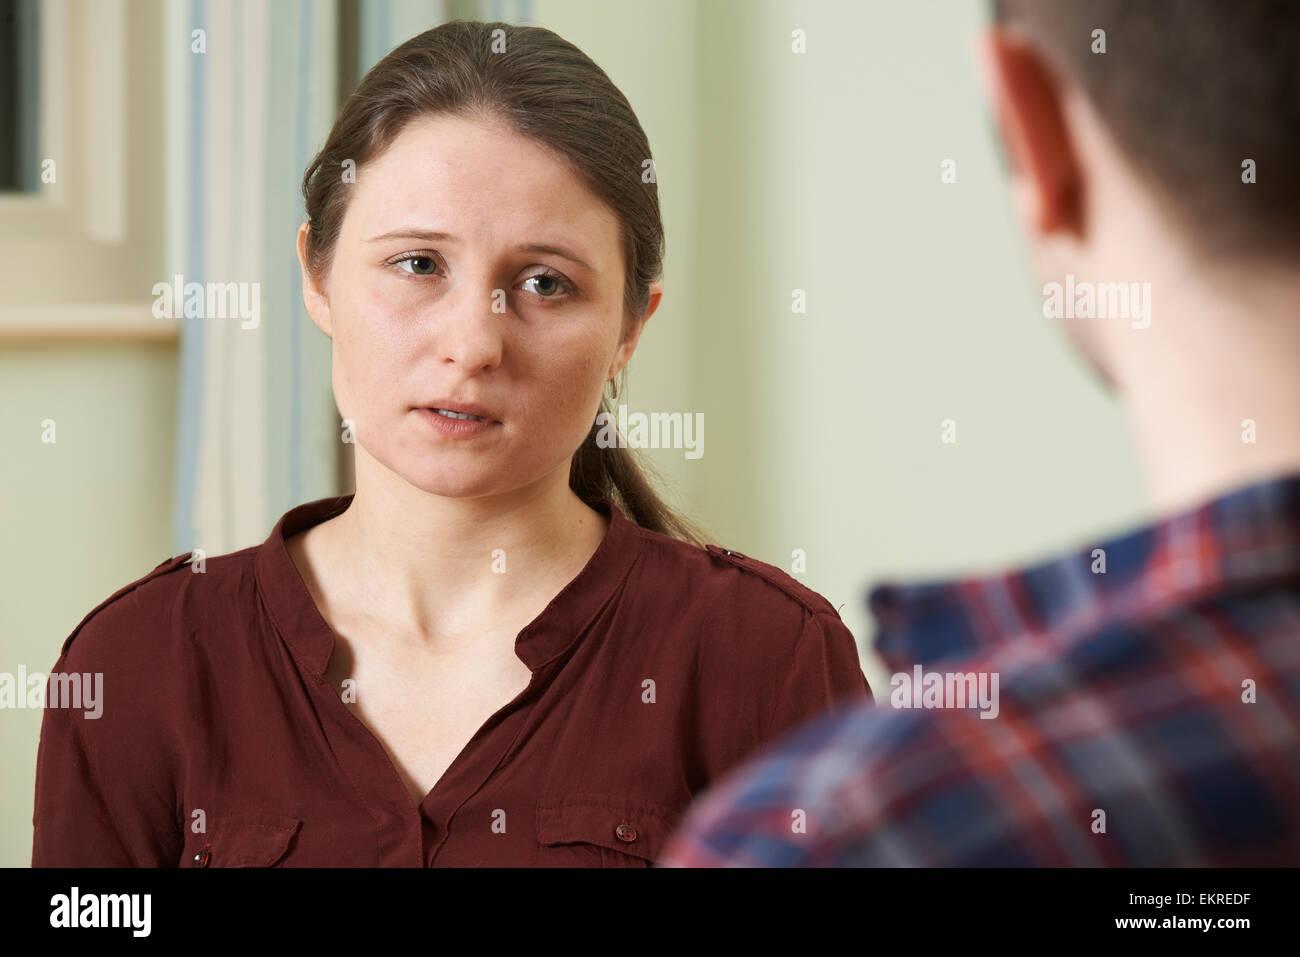 Depressive junge Frau im Gespräch mit Berater Stockbild